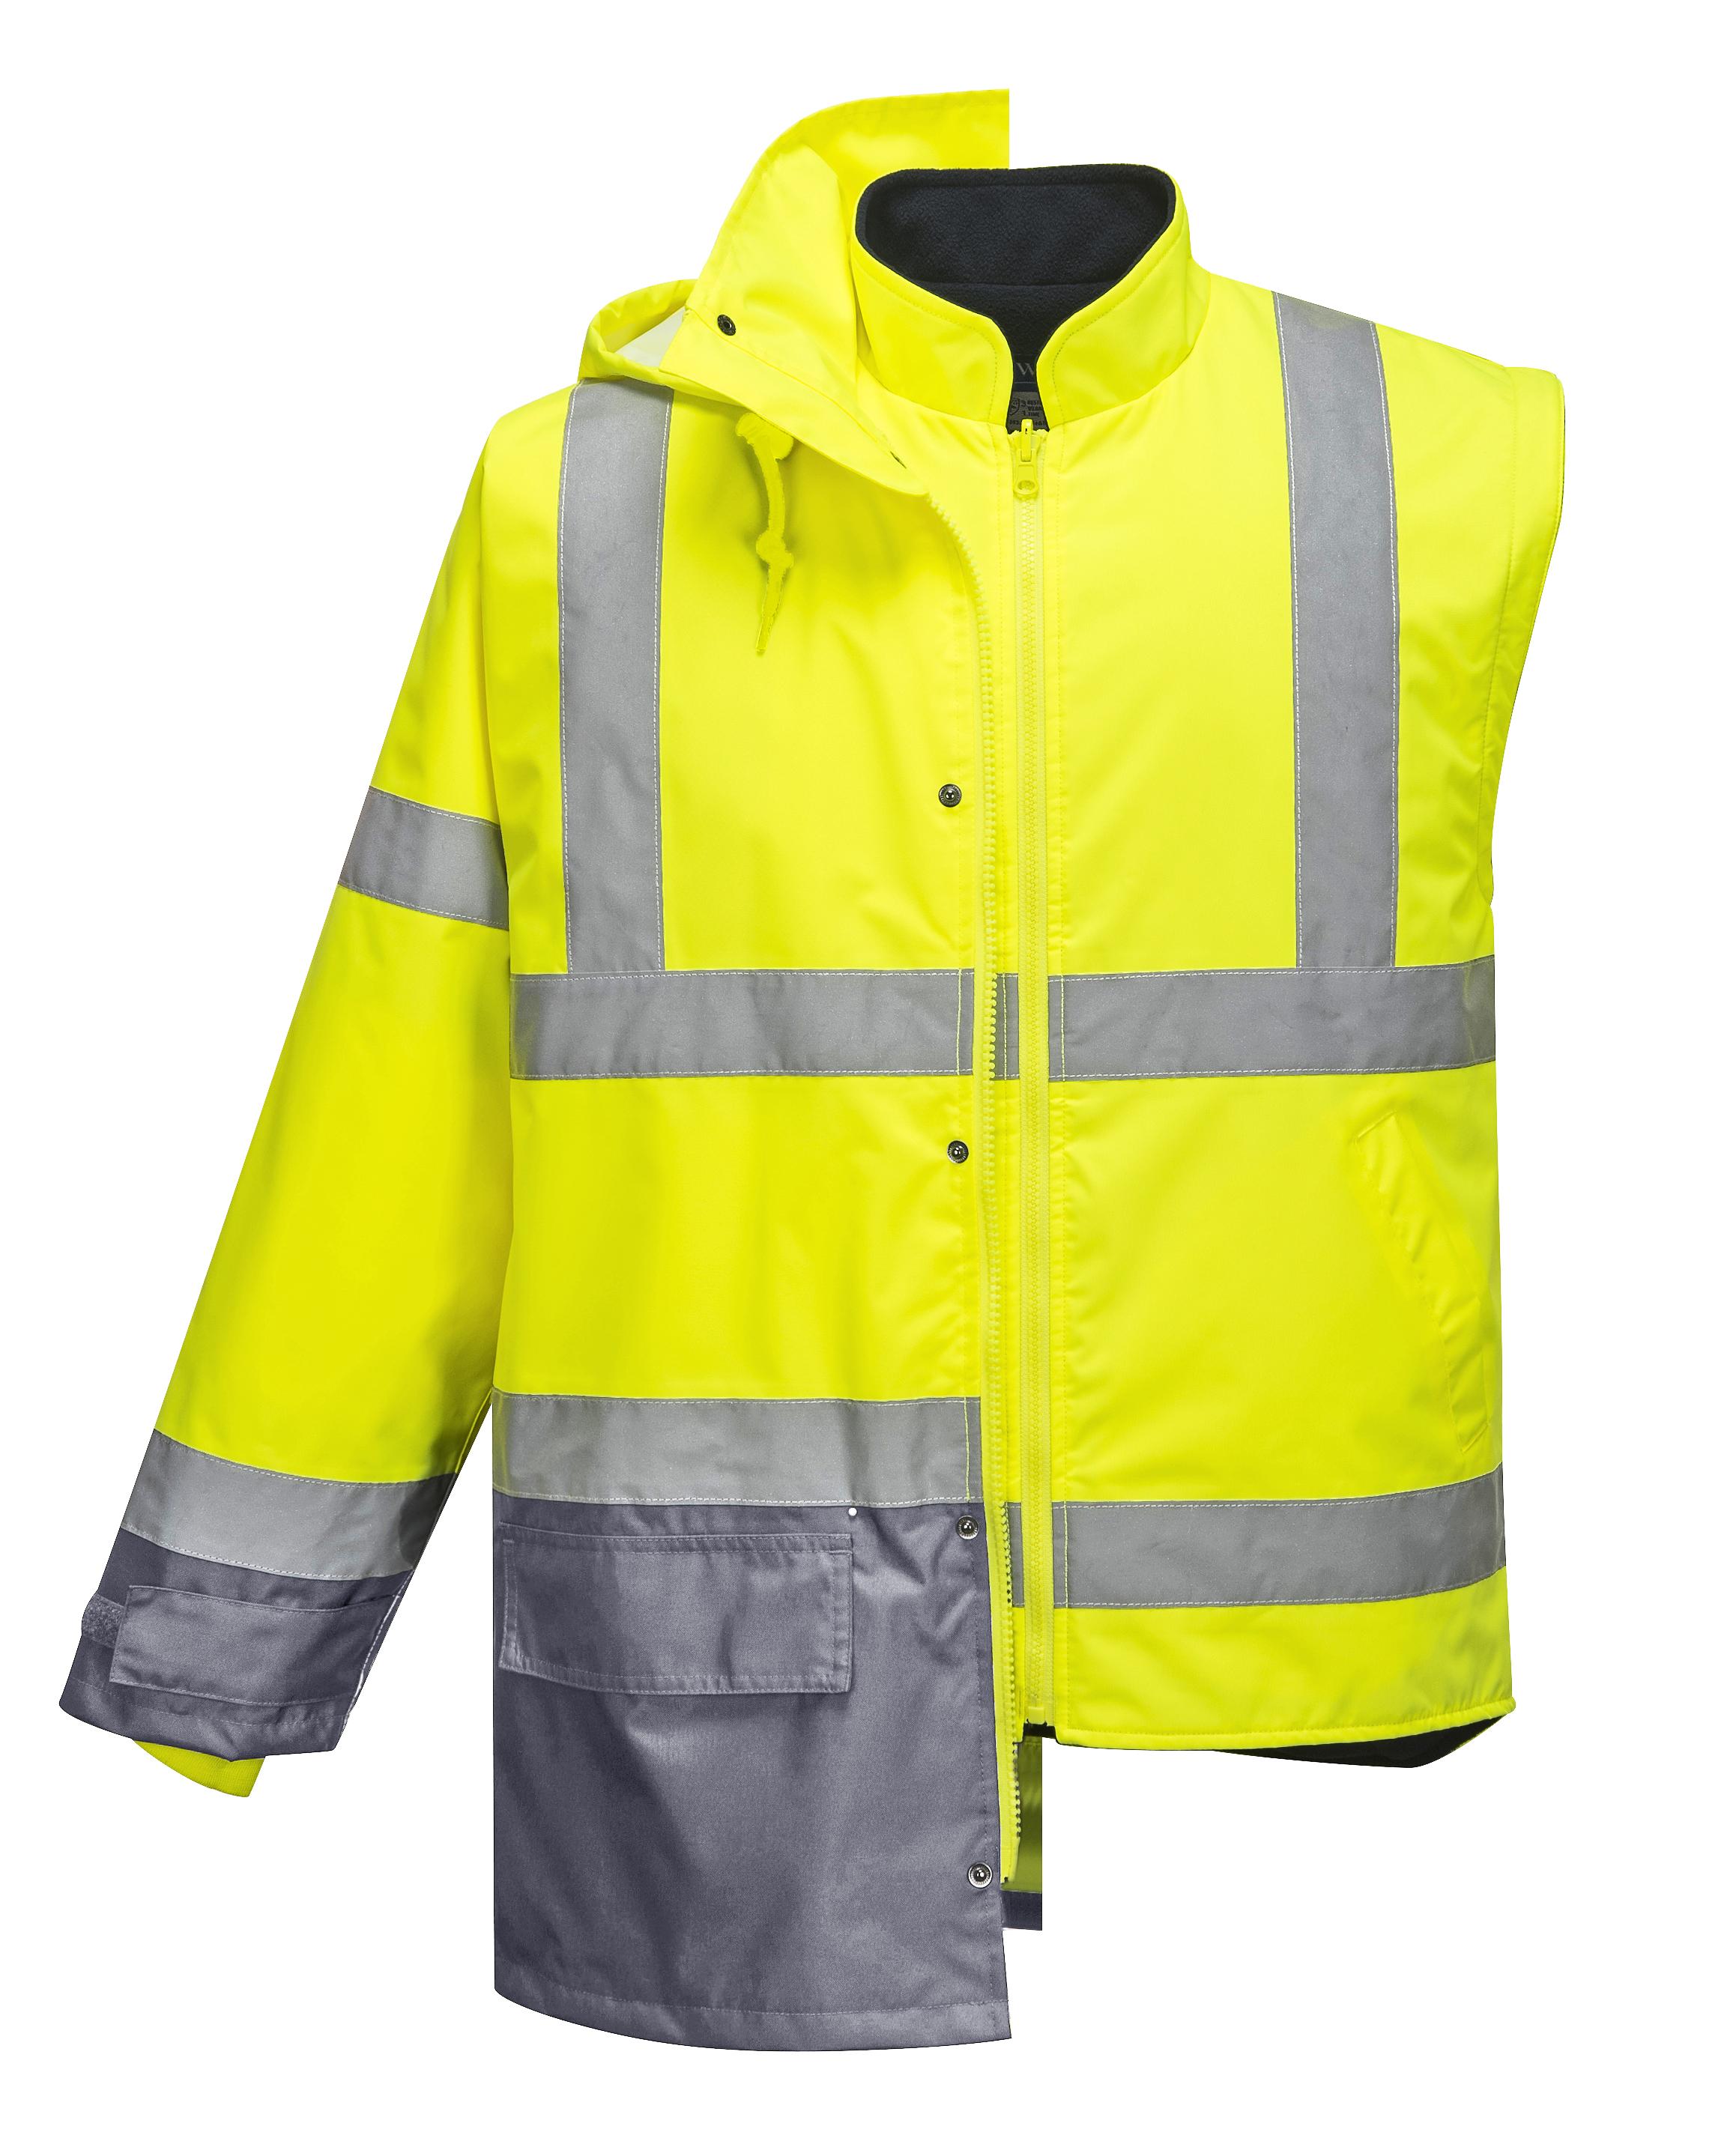 S768 Hi-Vis Executive 5-in-1 Jacket